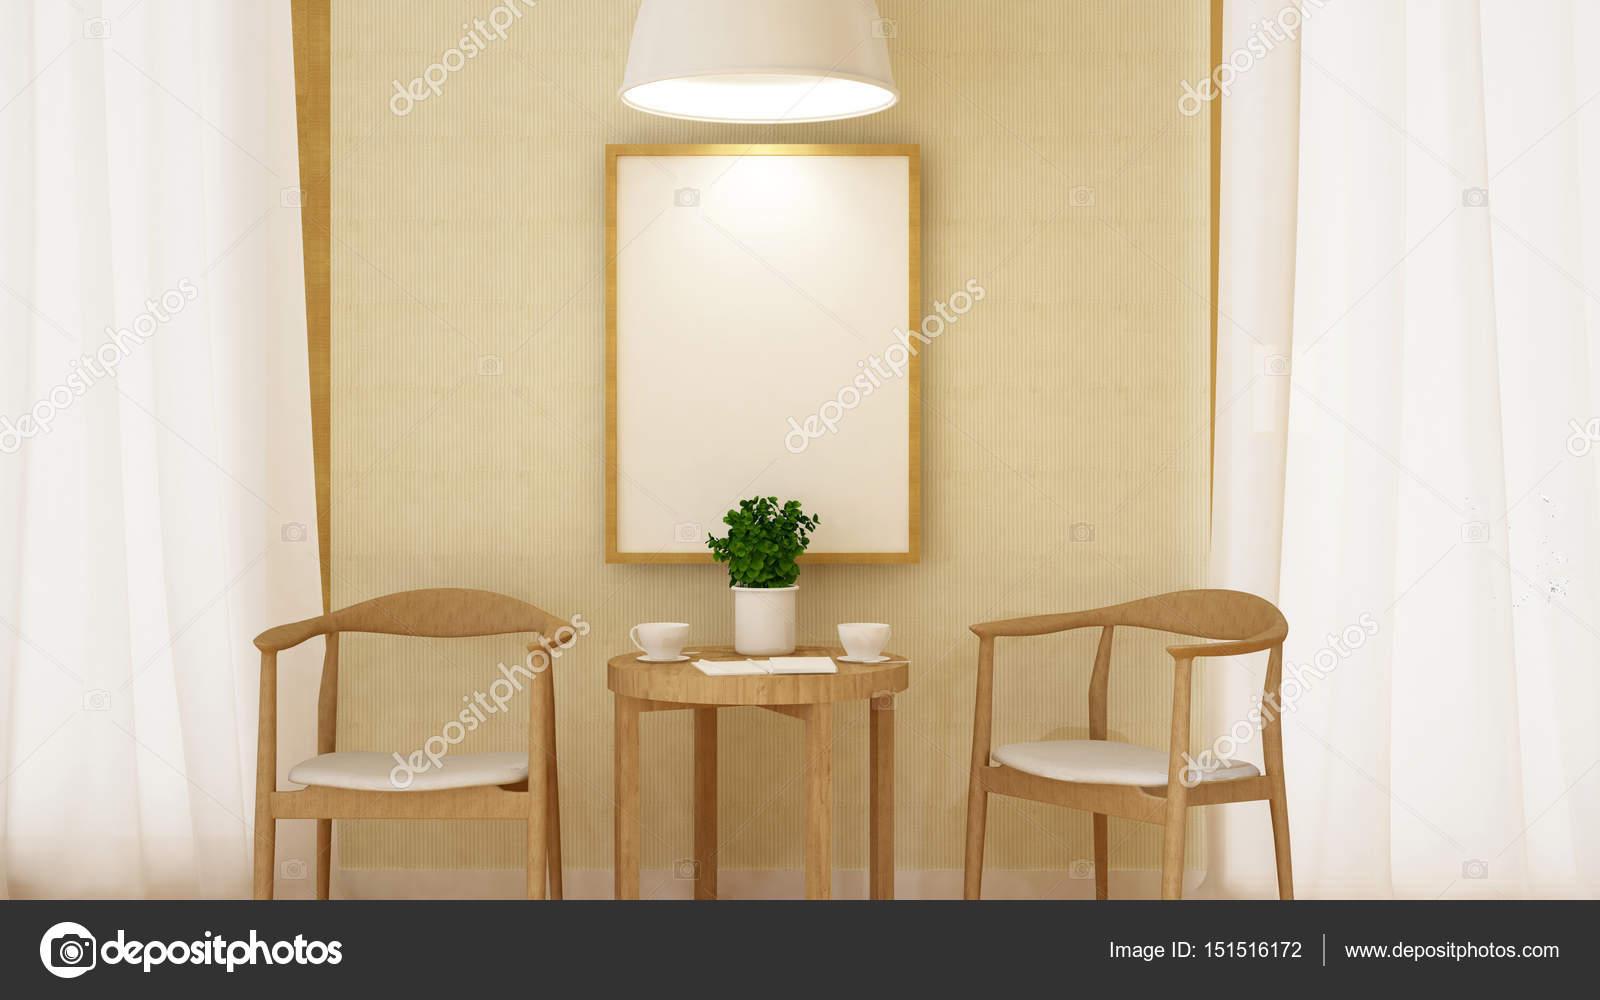 Kaffeepause mit Rahmen und Pendent Lamp - 3d Rendering — Stockfoto ...